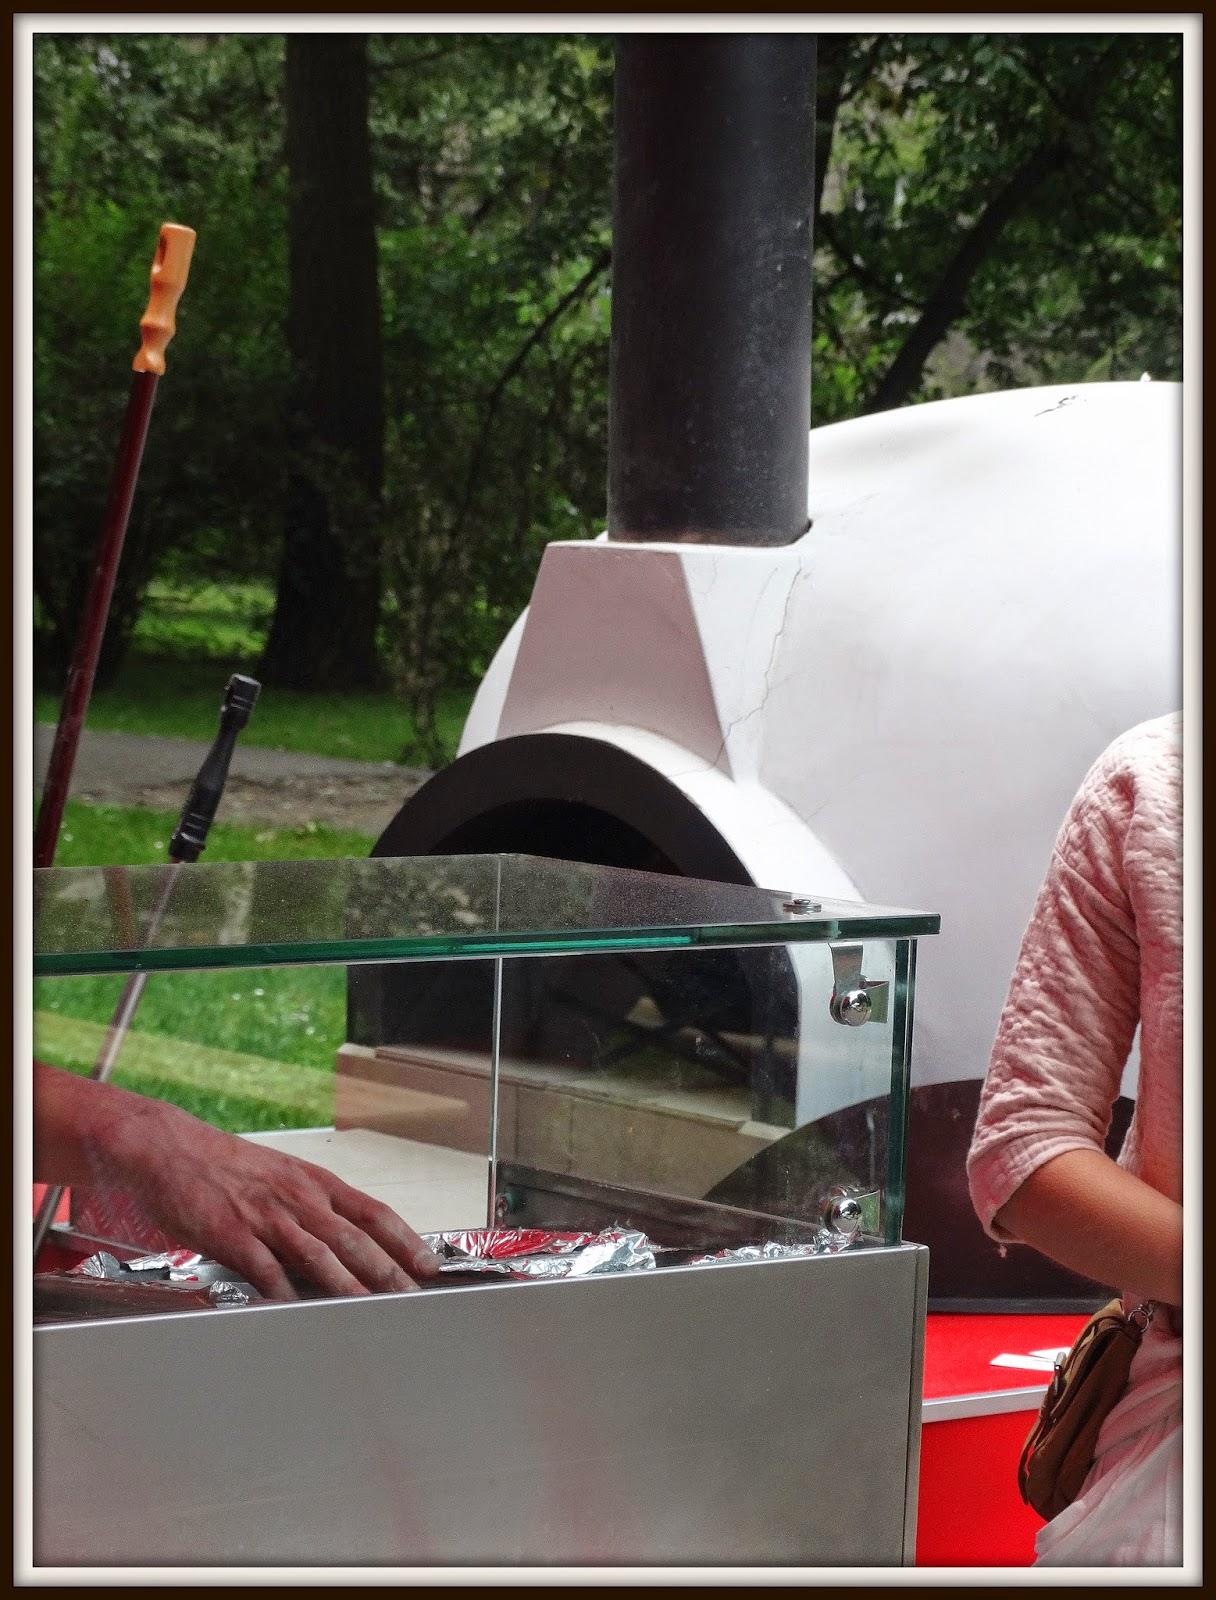 Targ Śniadaniowy, Park Krakowski, Piadina, Pizza, menu